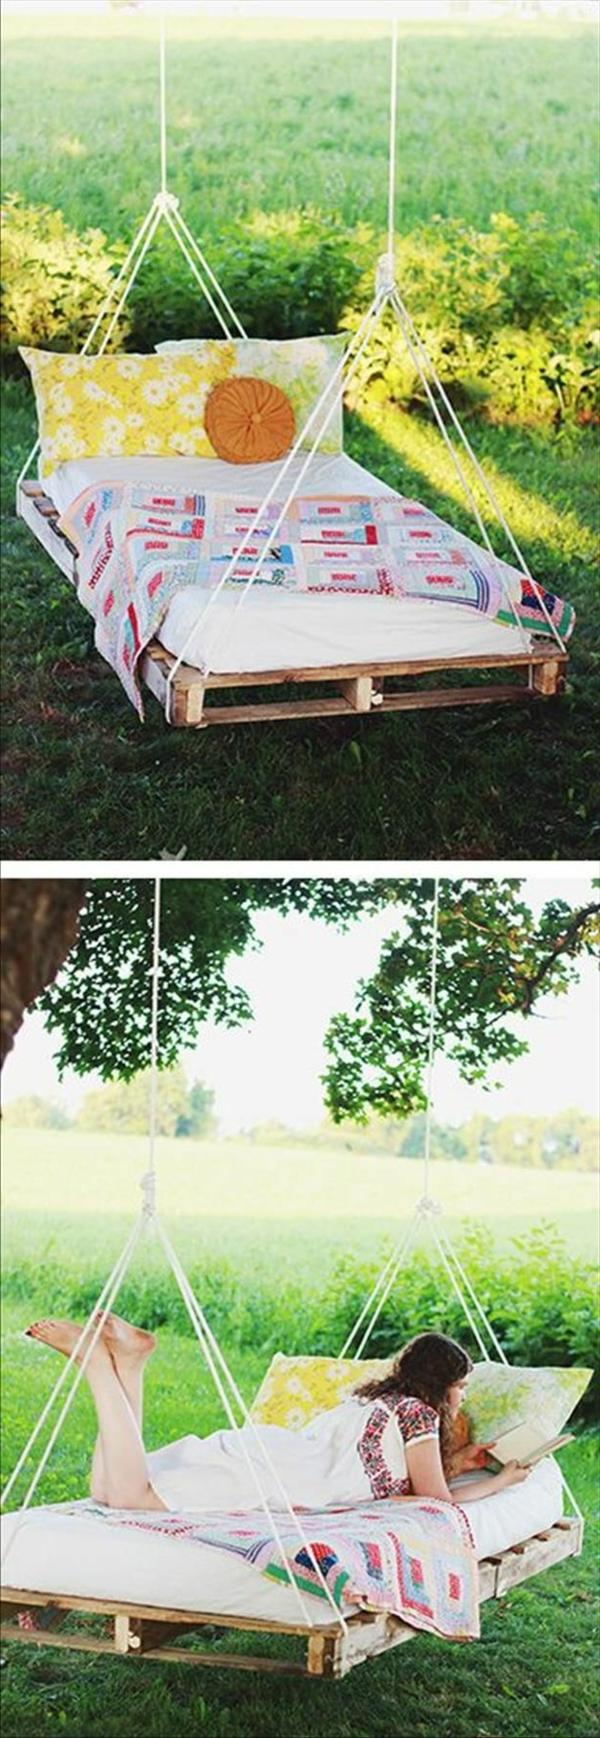 La-balançoire-de-jardin-swinguer-dehors-idée-du-jardin